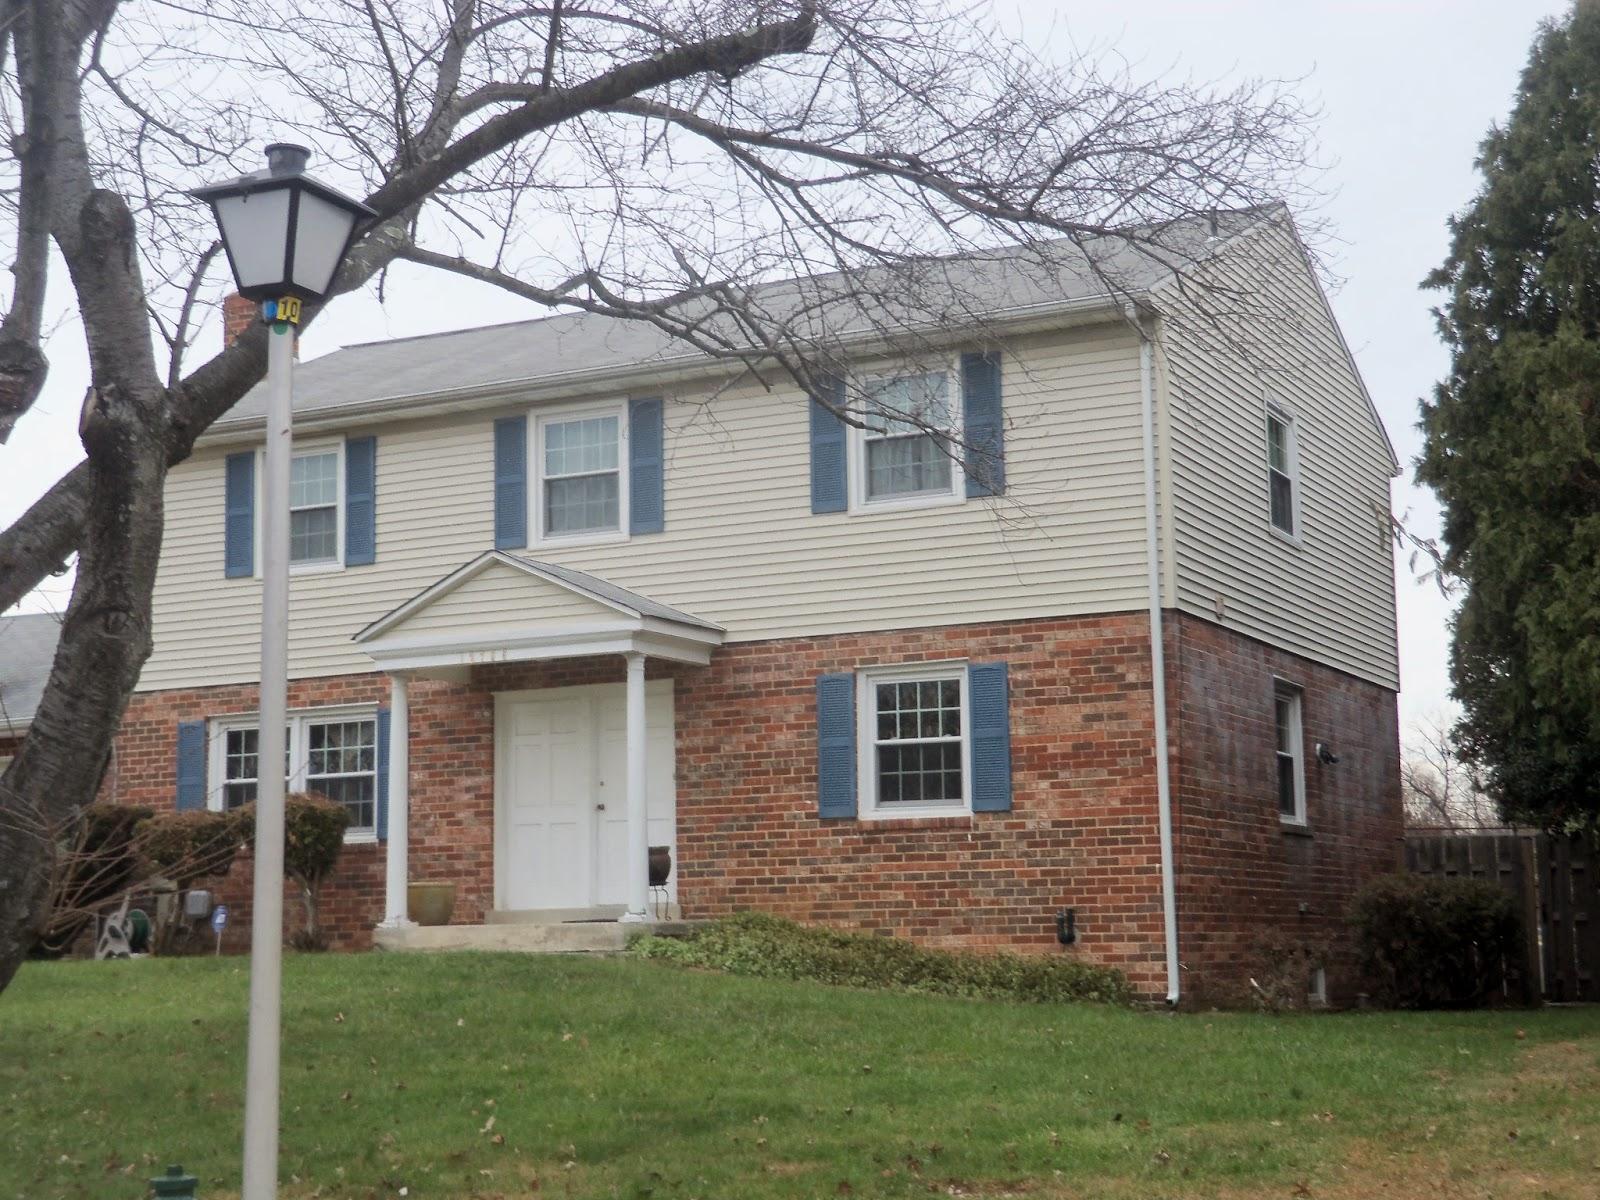 Upper marlboro Home For Sale